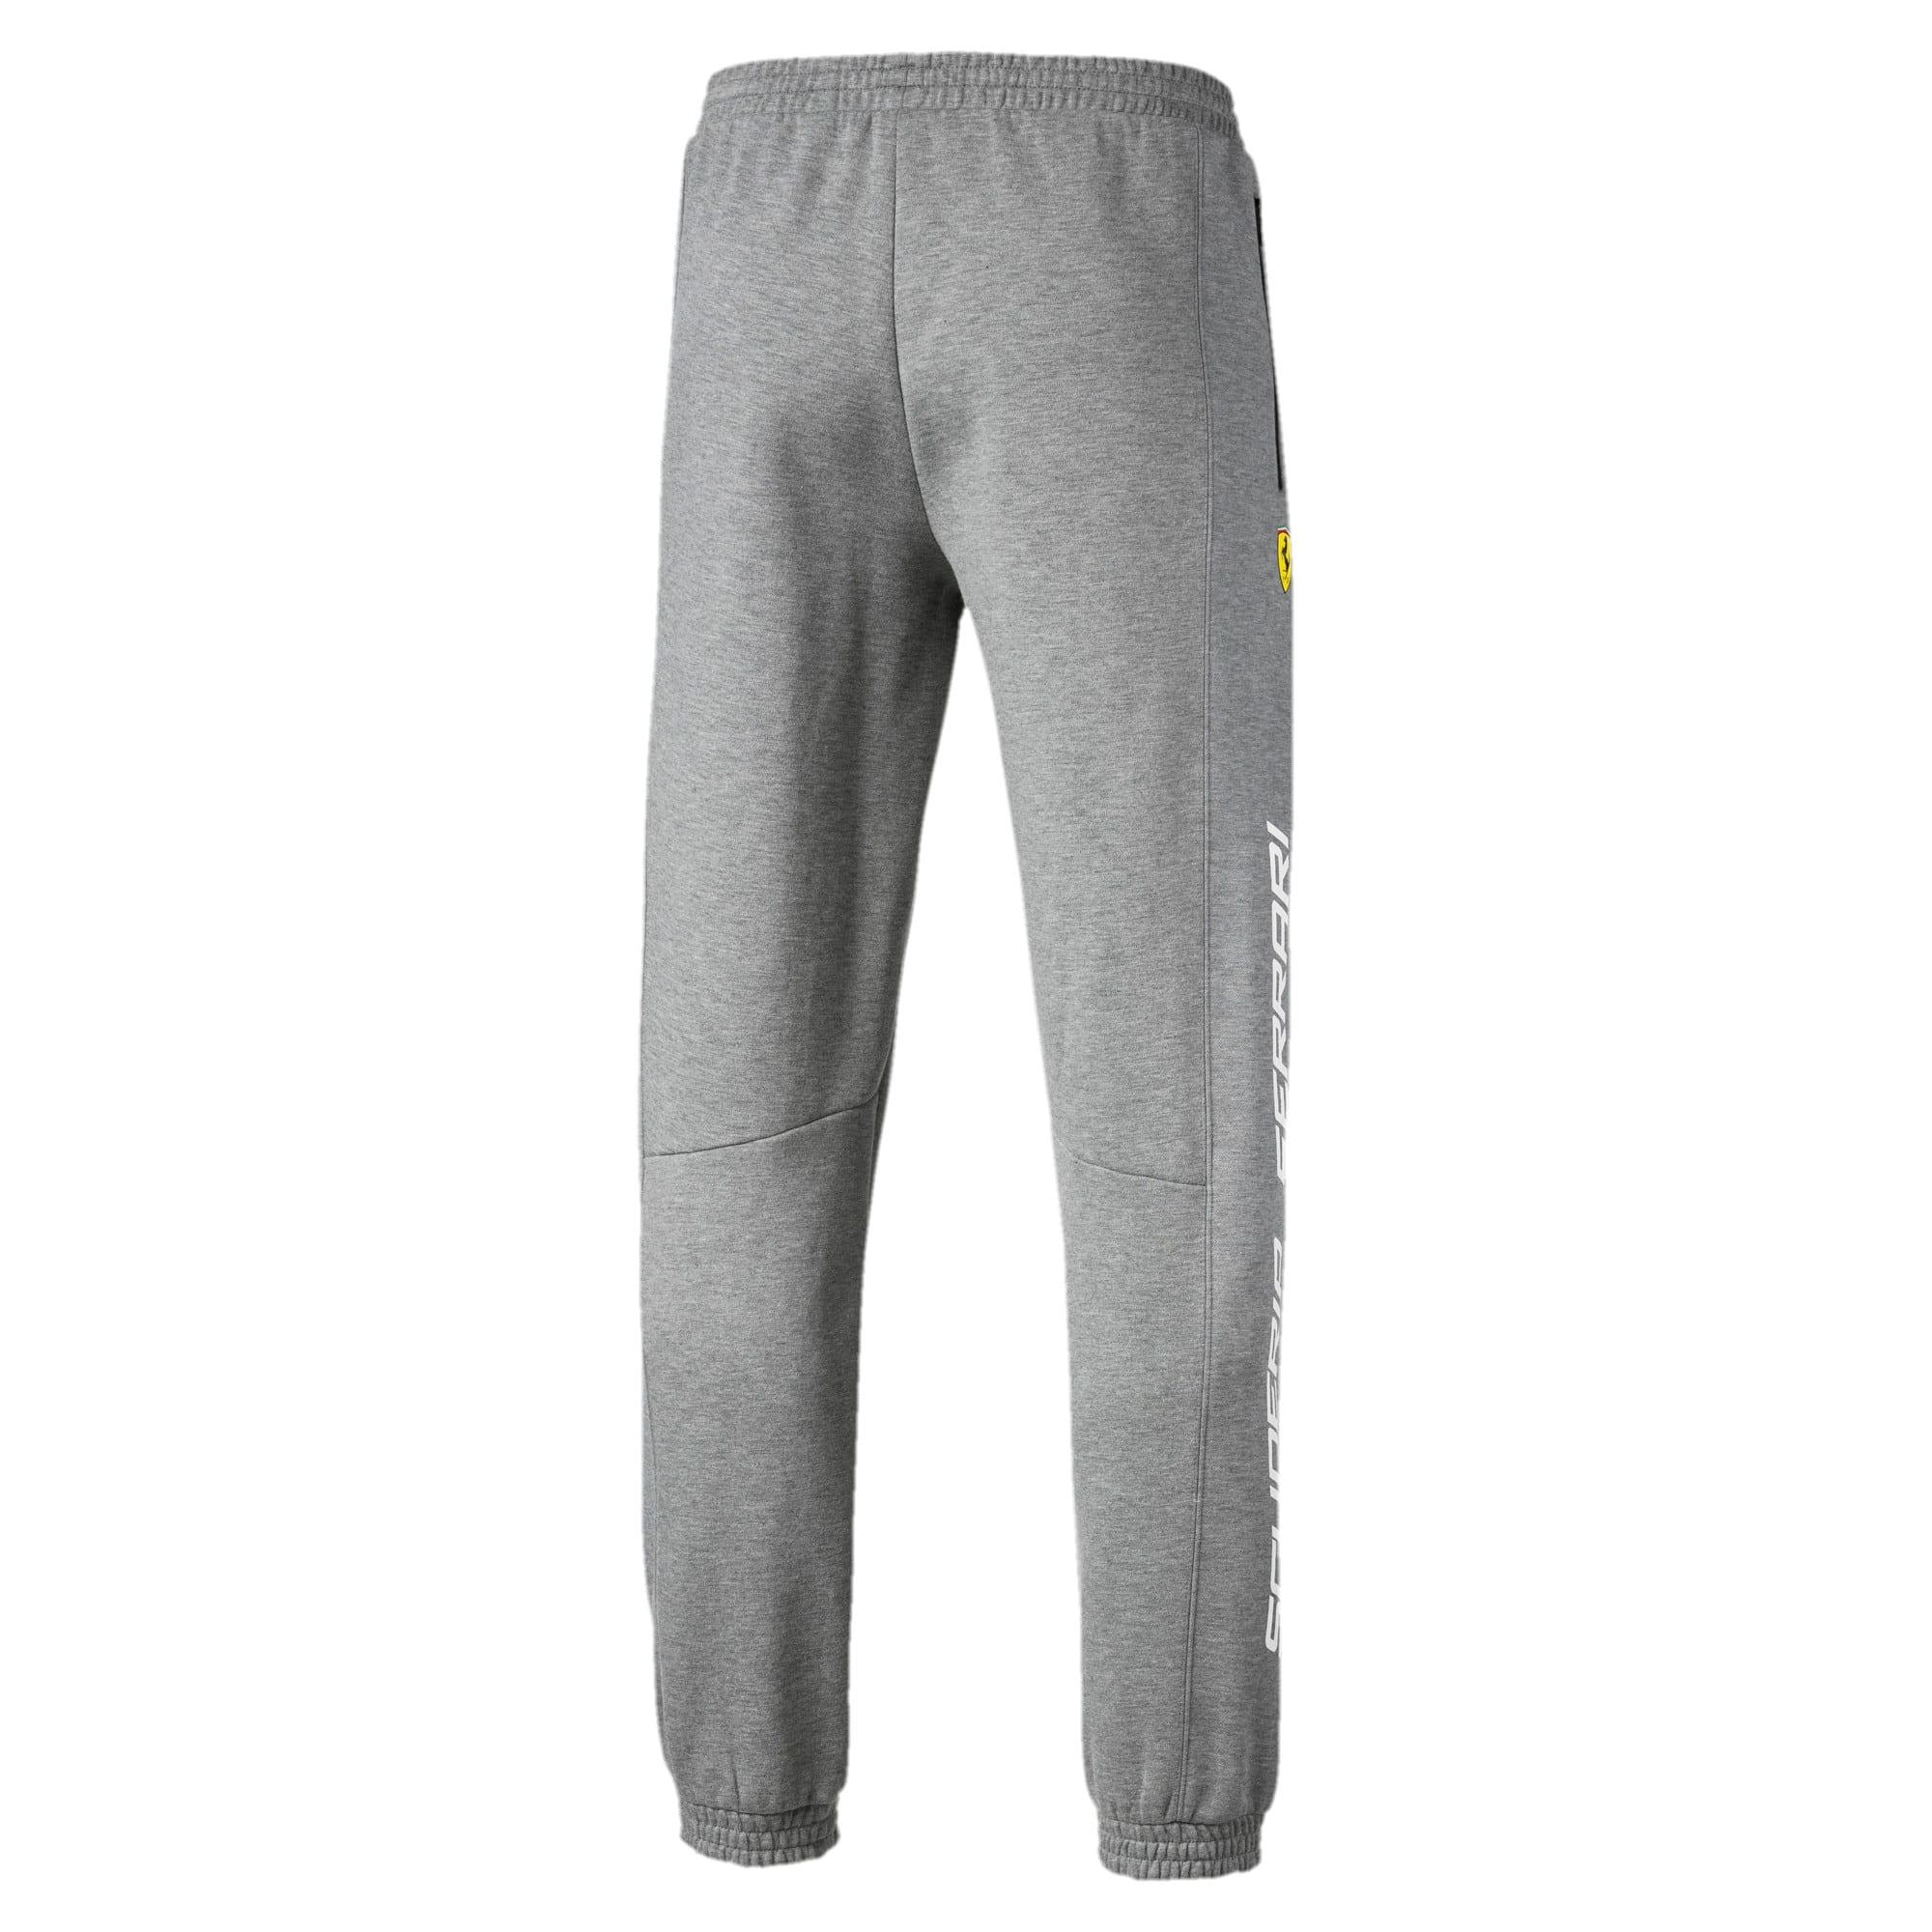 Thumbnail 2 of Scuderia Ferrari Men's Sweatpants, Medium Gray Heather, medium